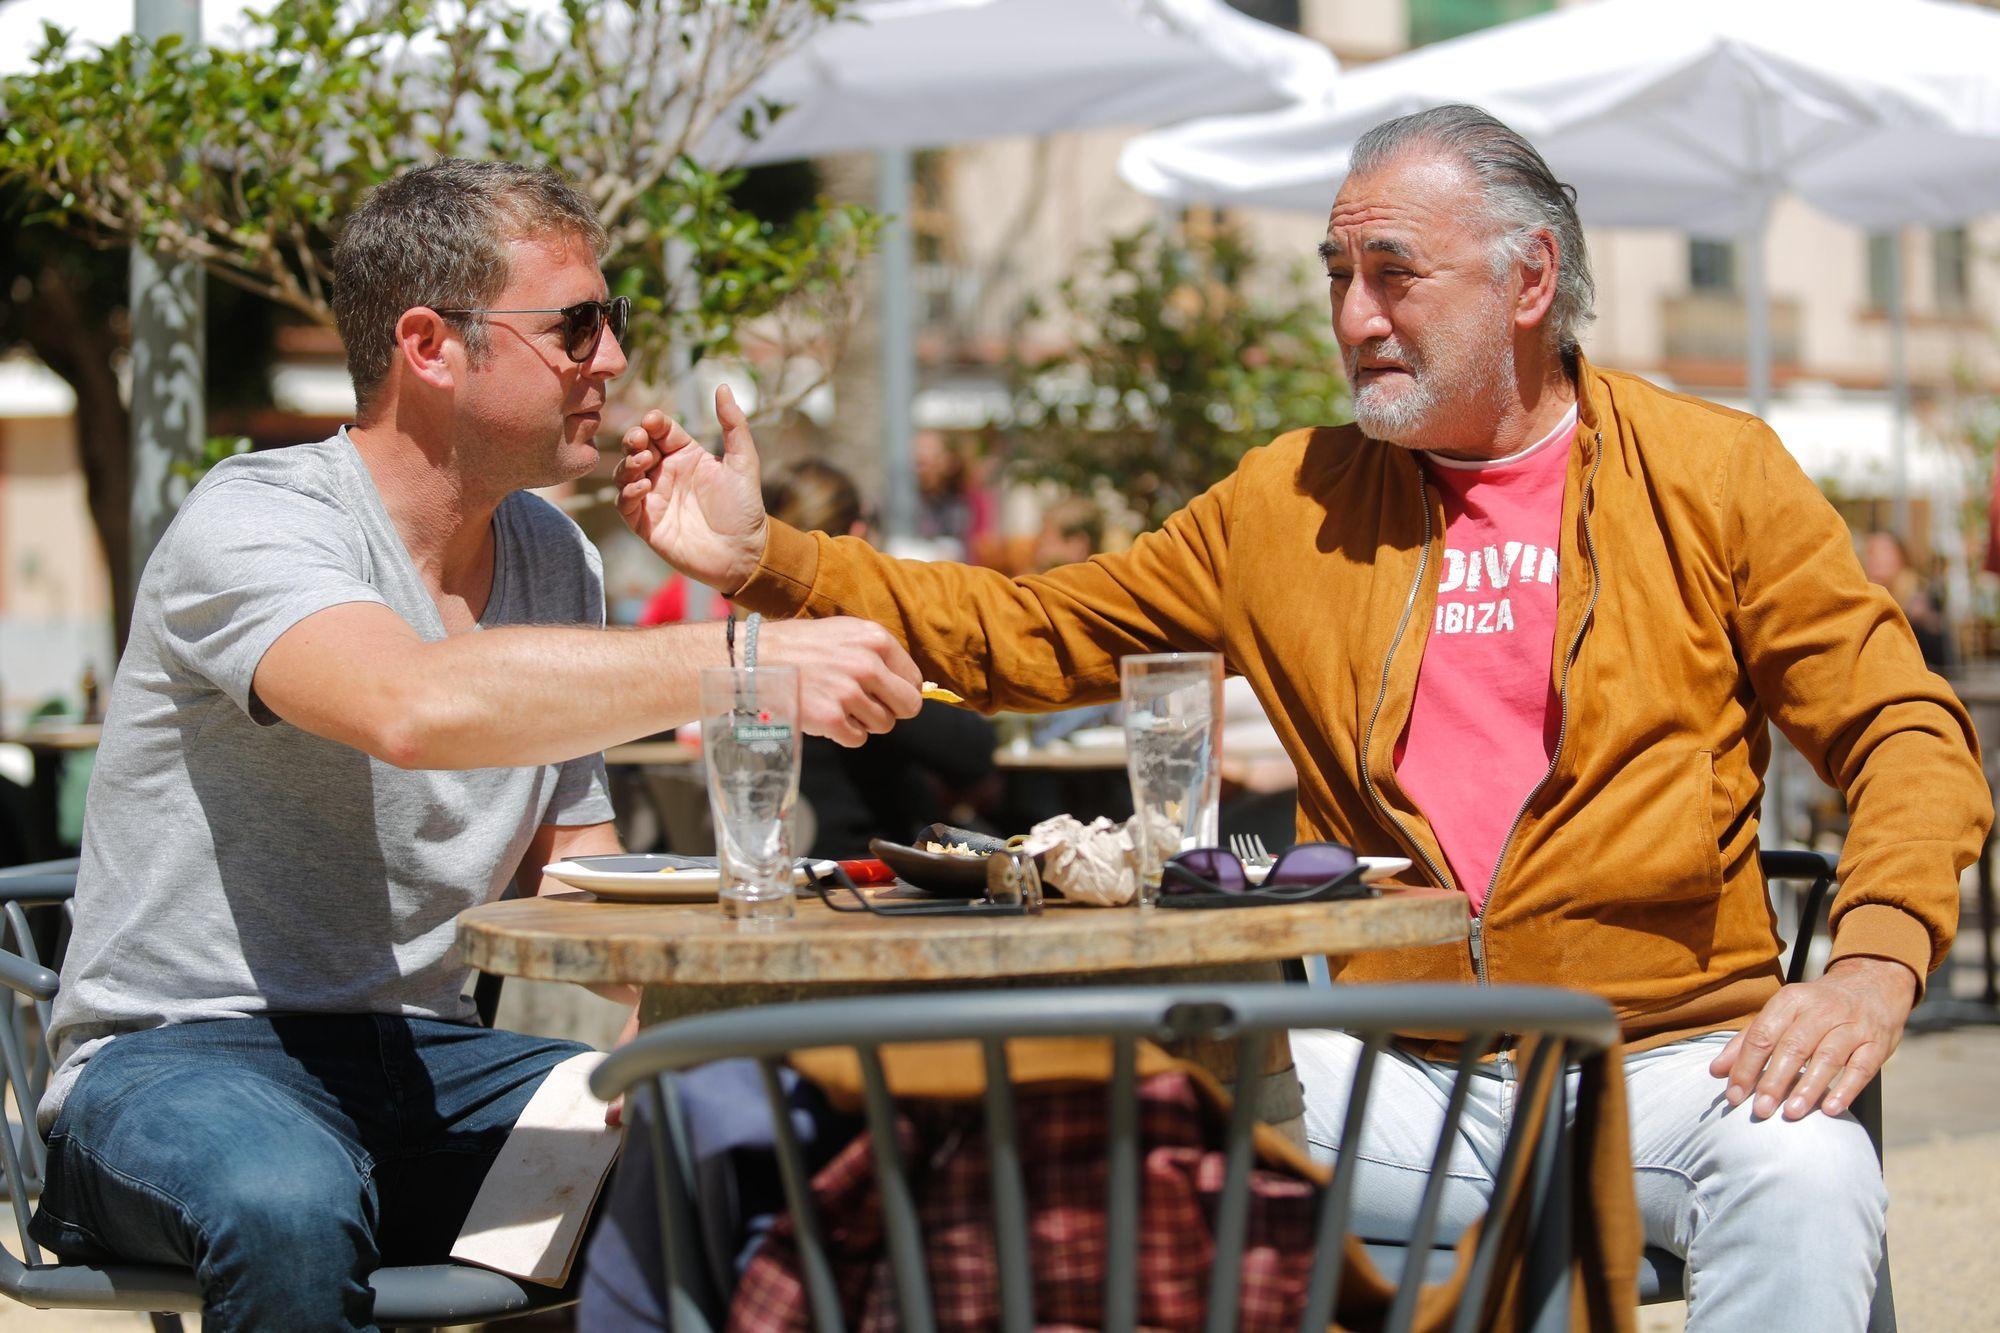 El doble de Robert de Niro, de terraceo en Ibiza